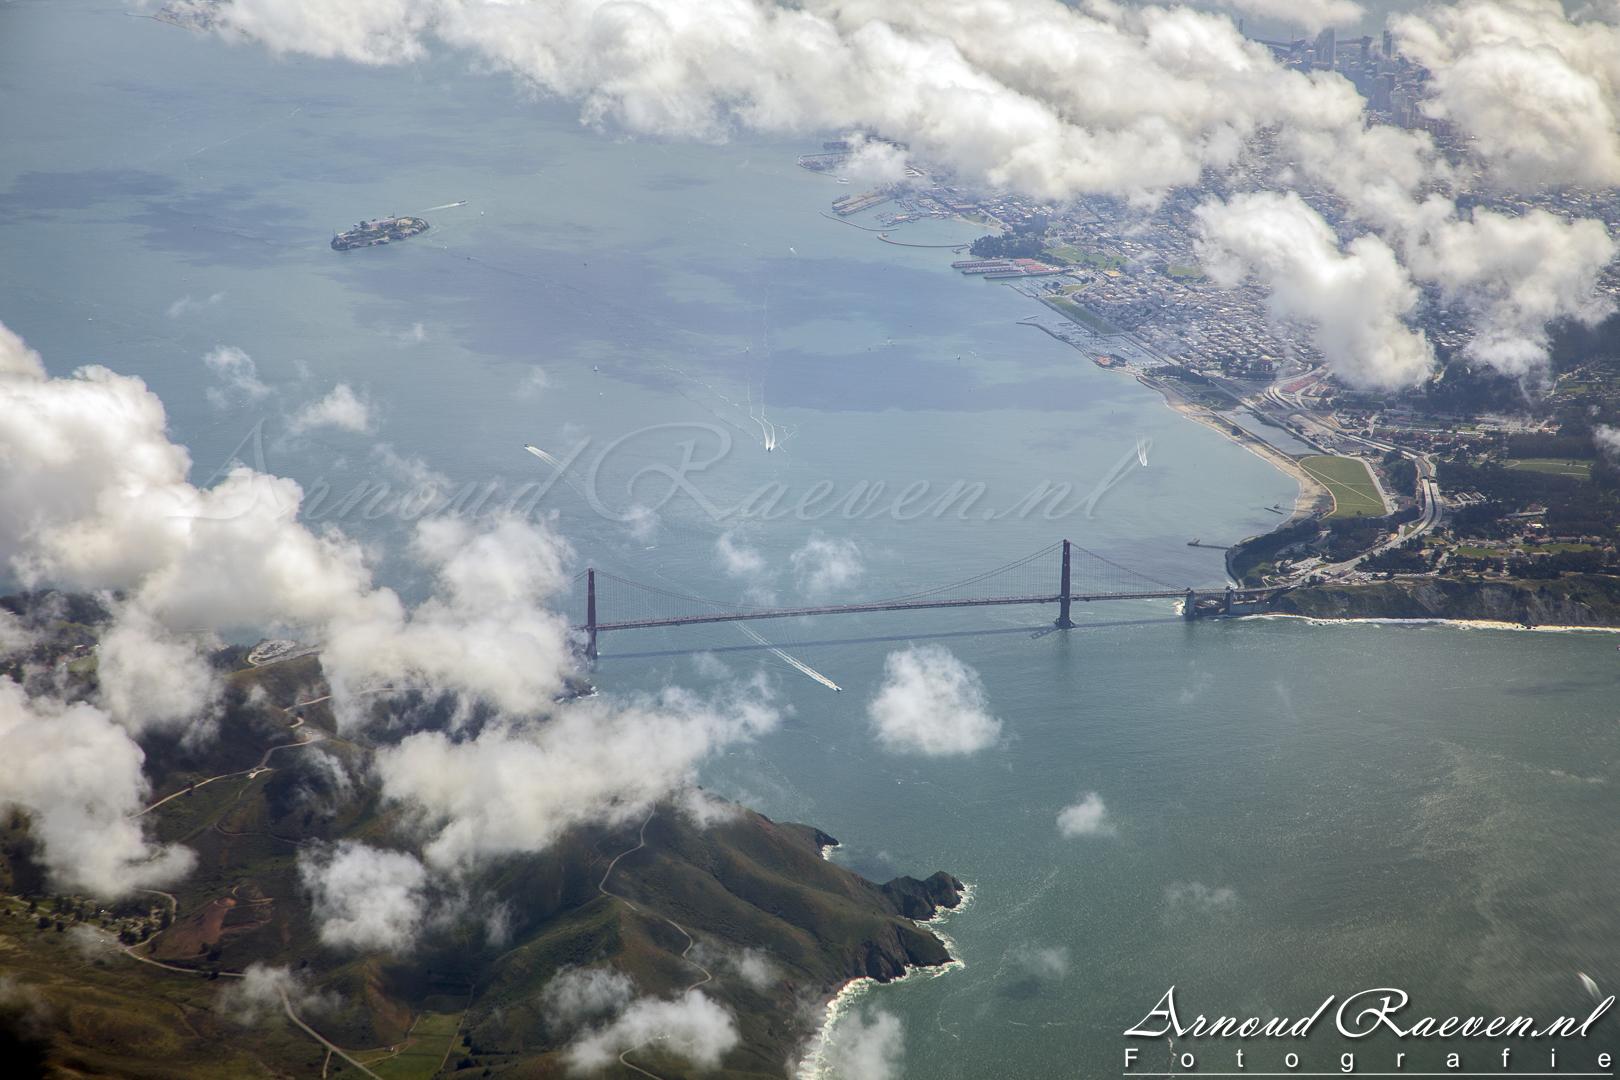 Golden Gate Brigde & Alcatraz